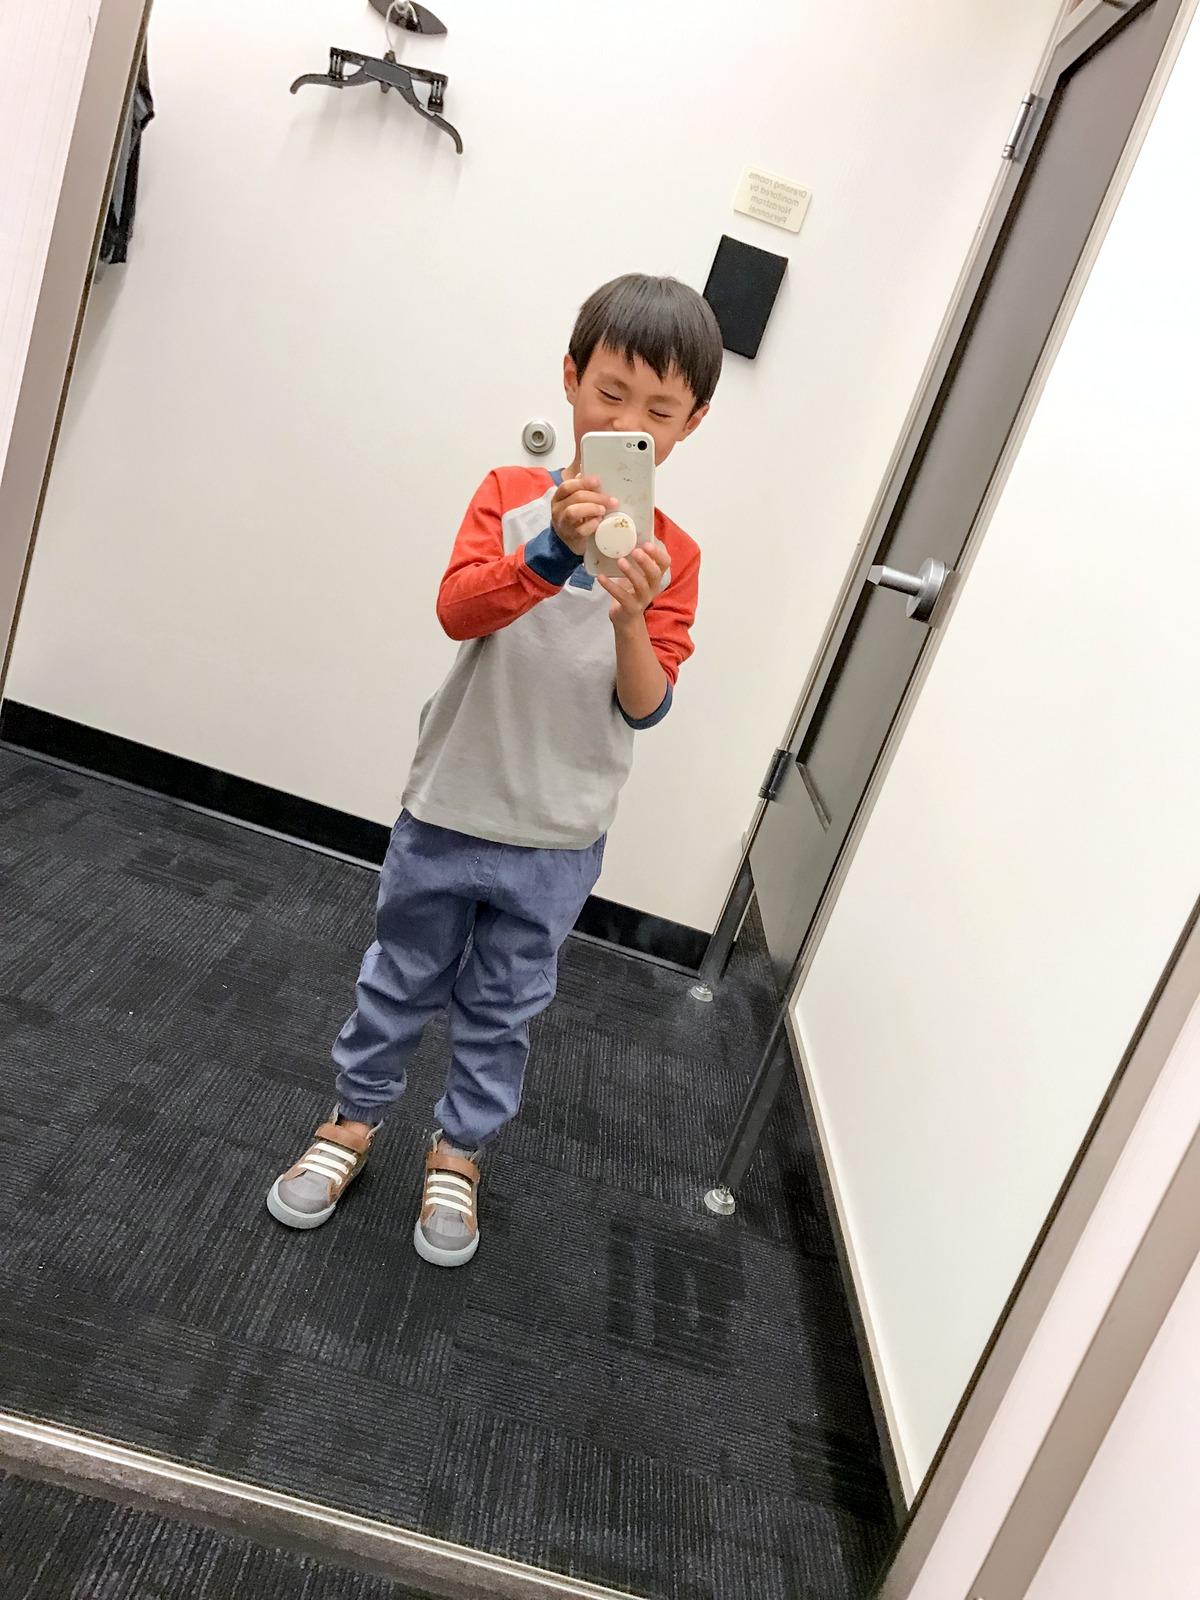 Nordstrom Sale: Best of Baby Essentials + Kid's Fashion by Utah fashion blogger Sandy A La Mode